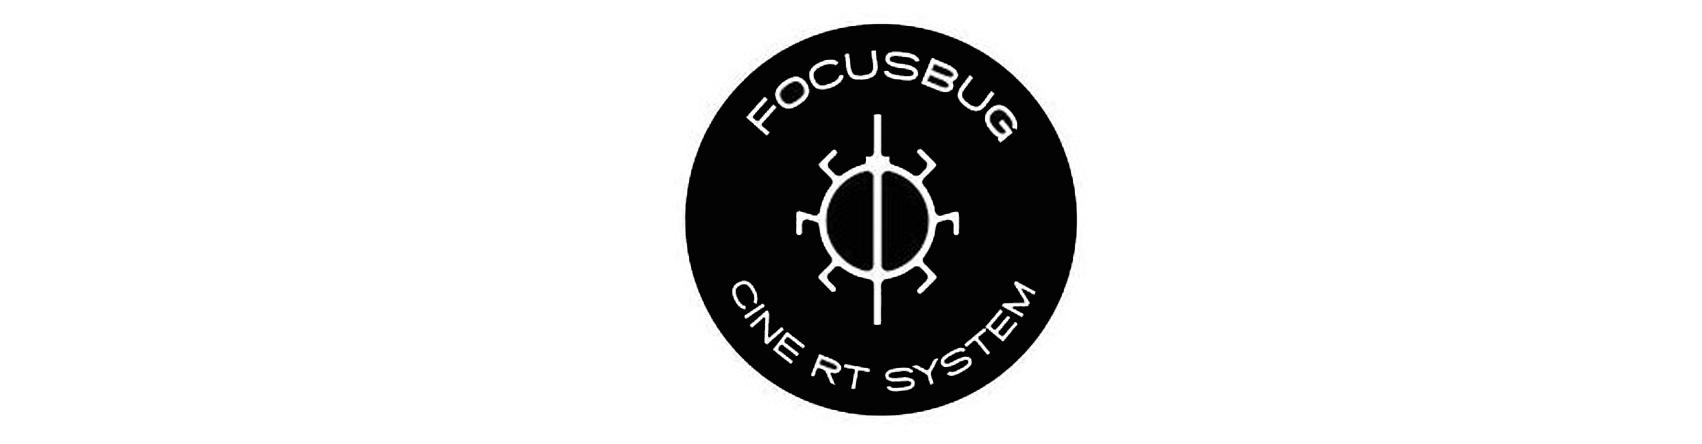 Focusbug logo